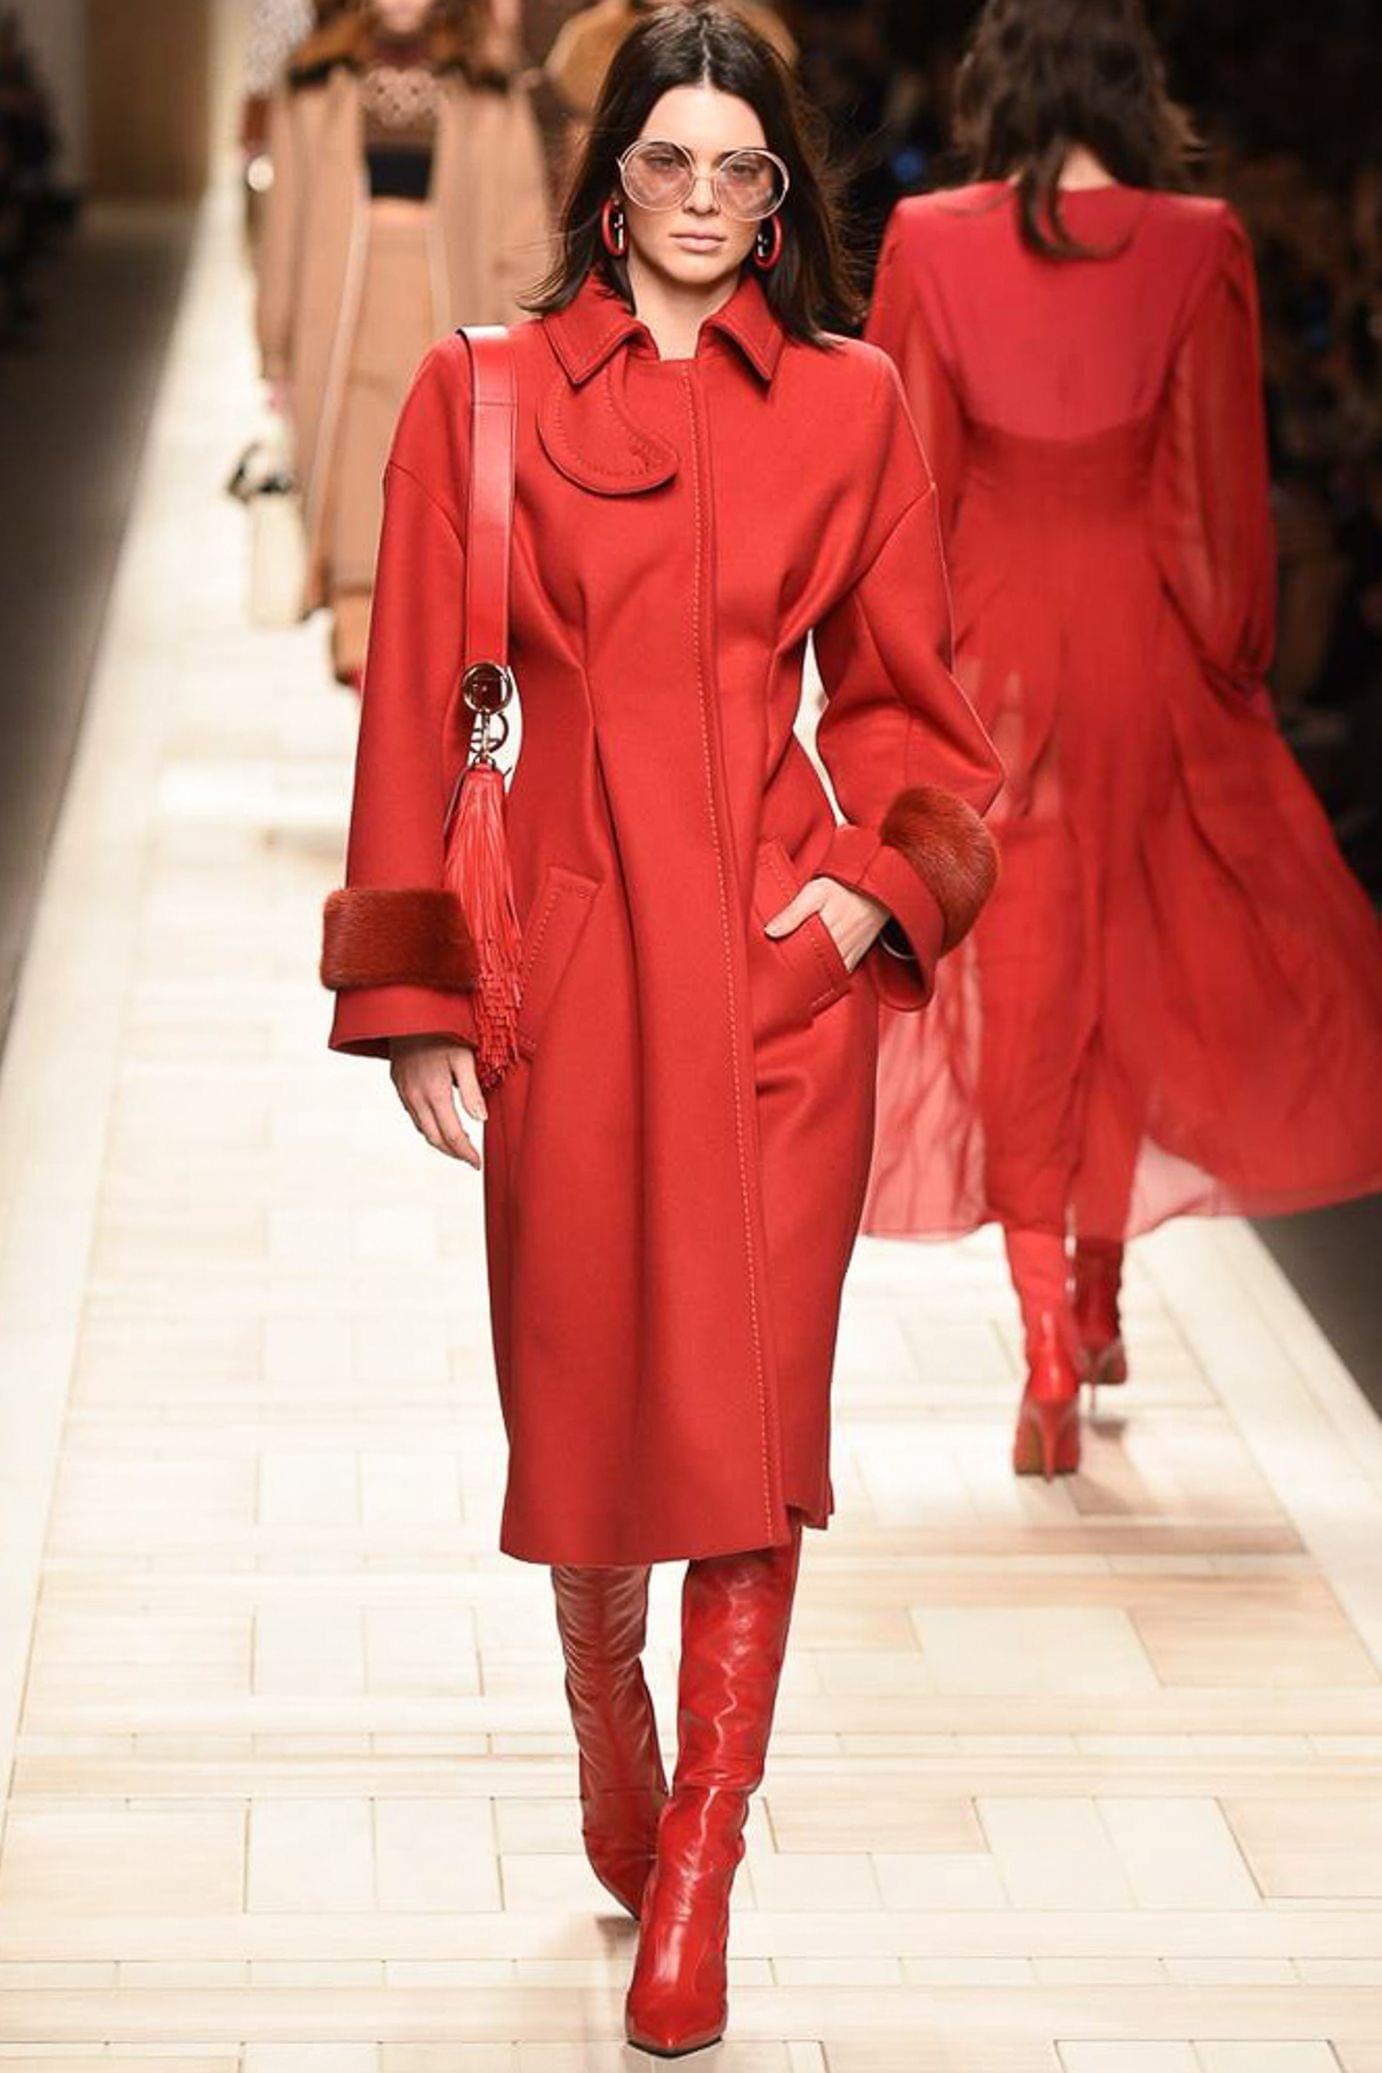 Fashionable female coats autumn-winter 2017-2018 year 35